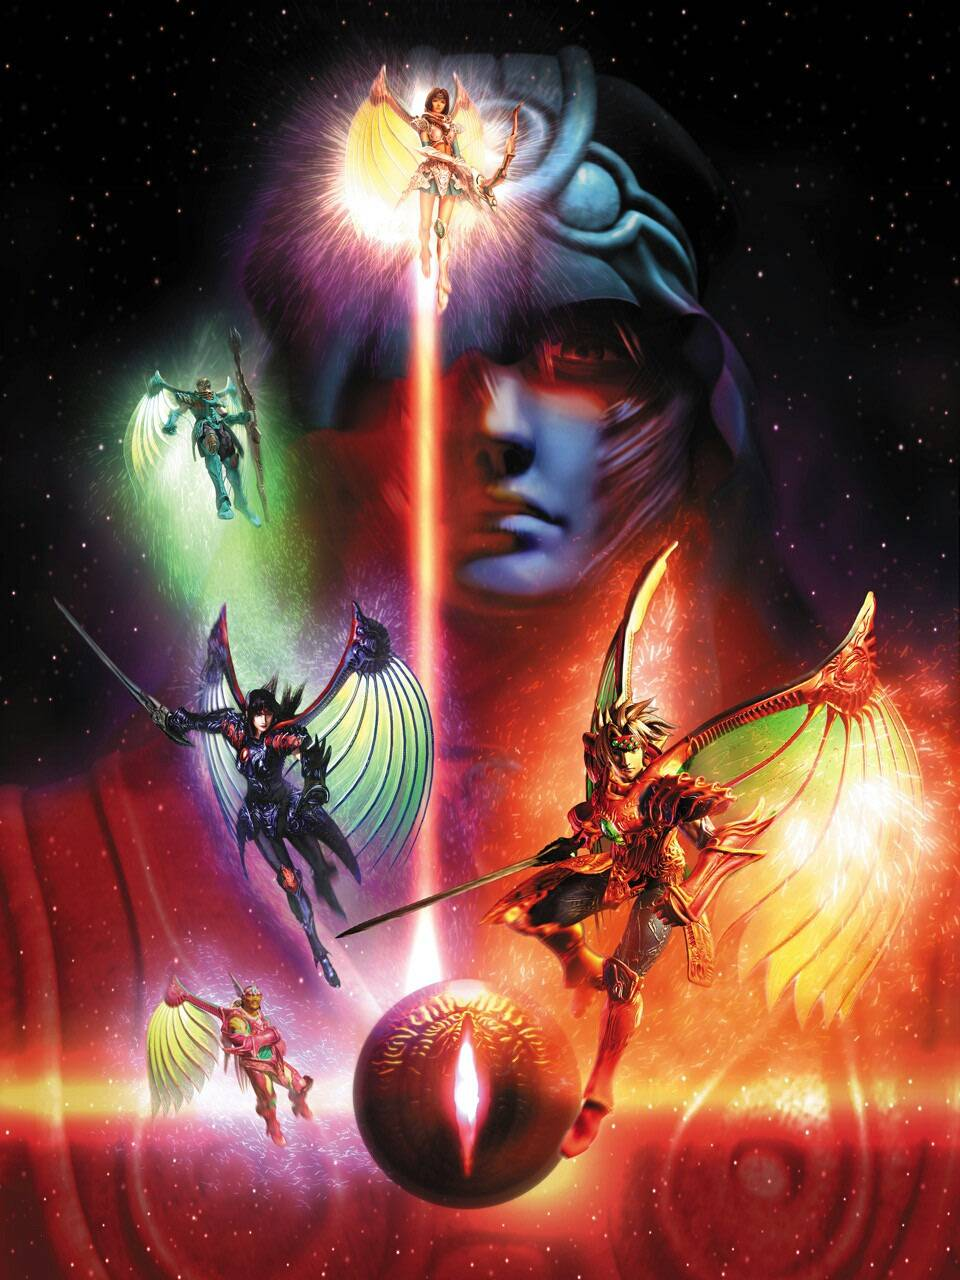 Legend Of Dragoon 1 Wallpaper By Jollyrancher690 56 Free On Zedge